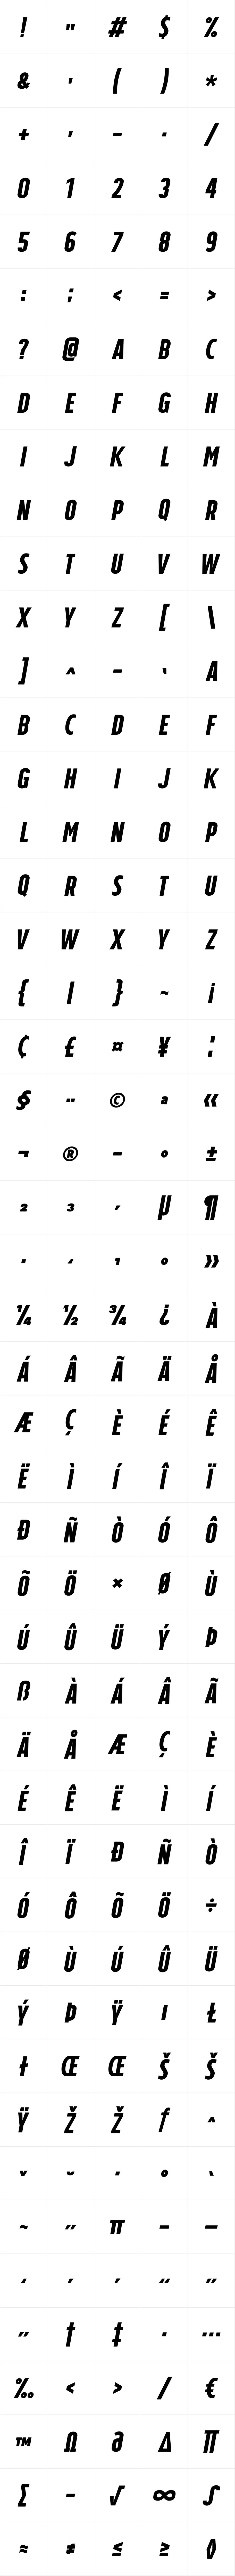 Tolyer Bold no4 Oblique